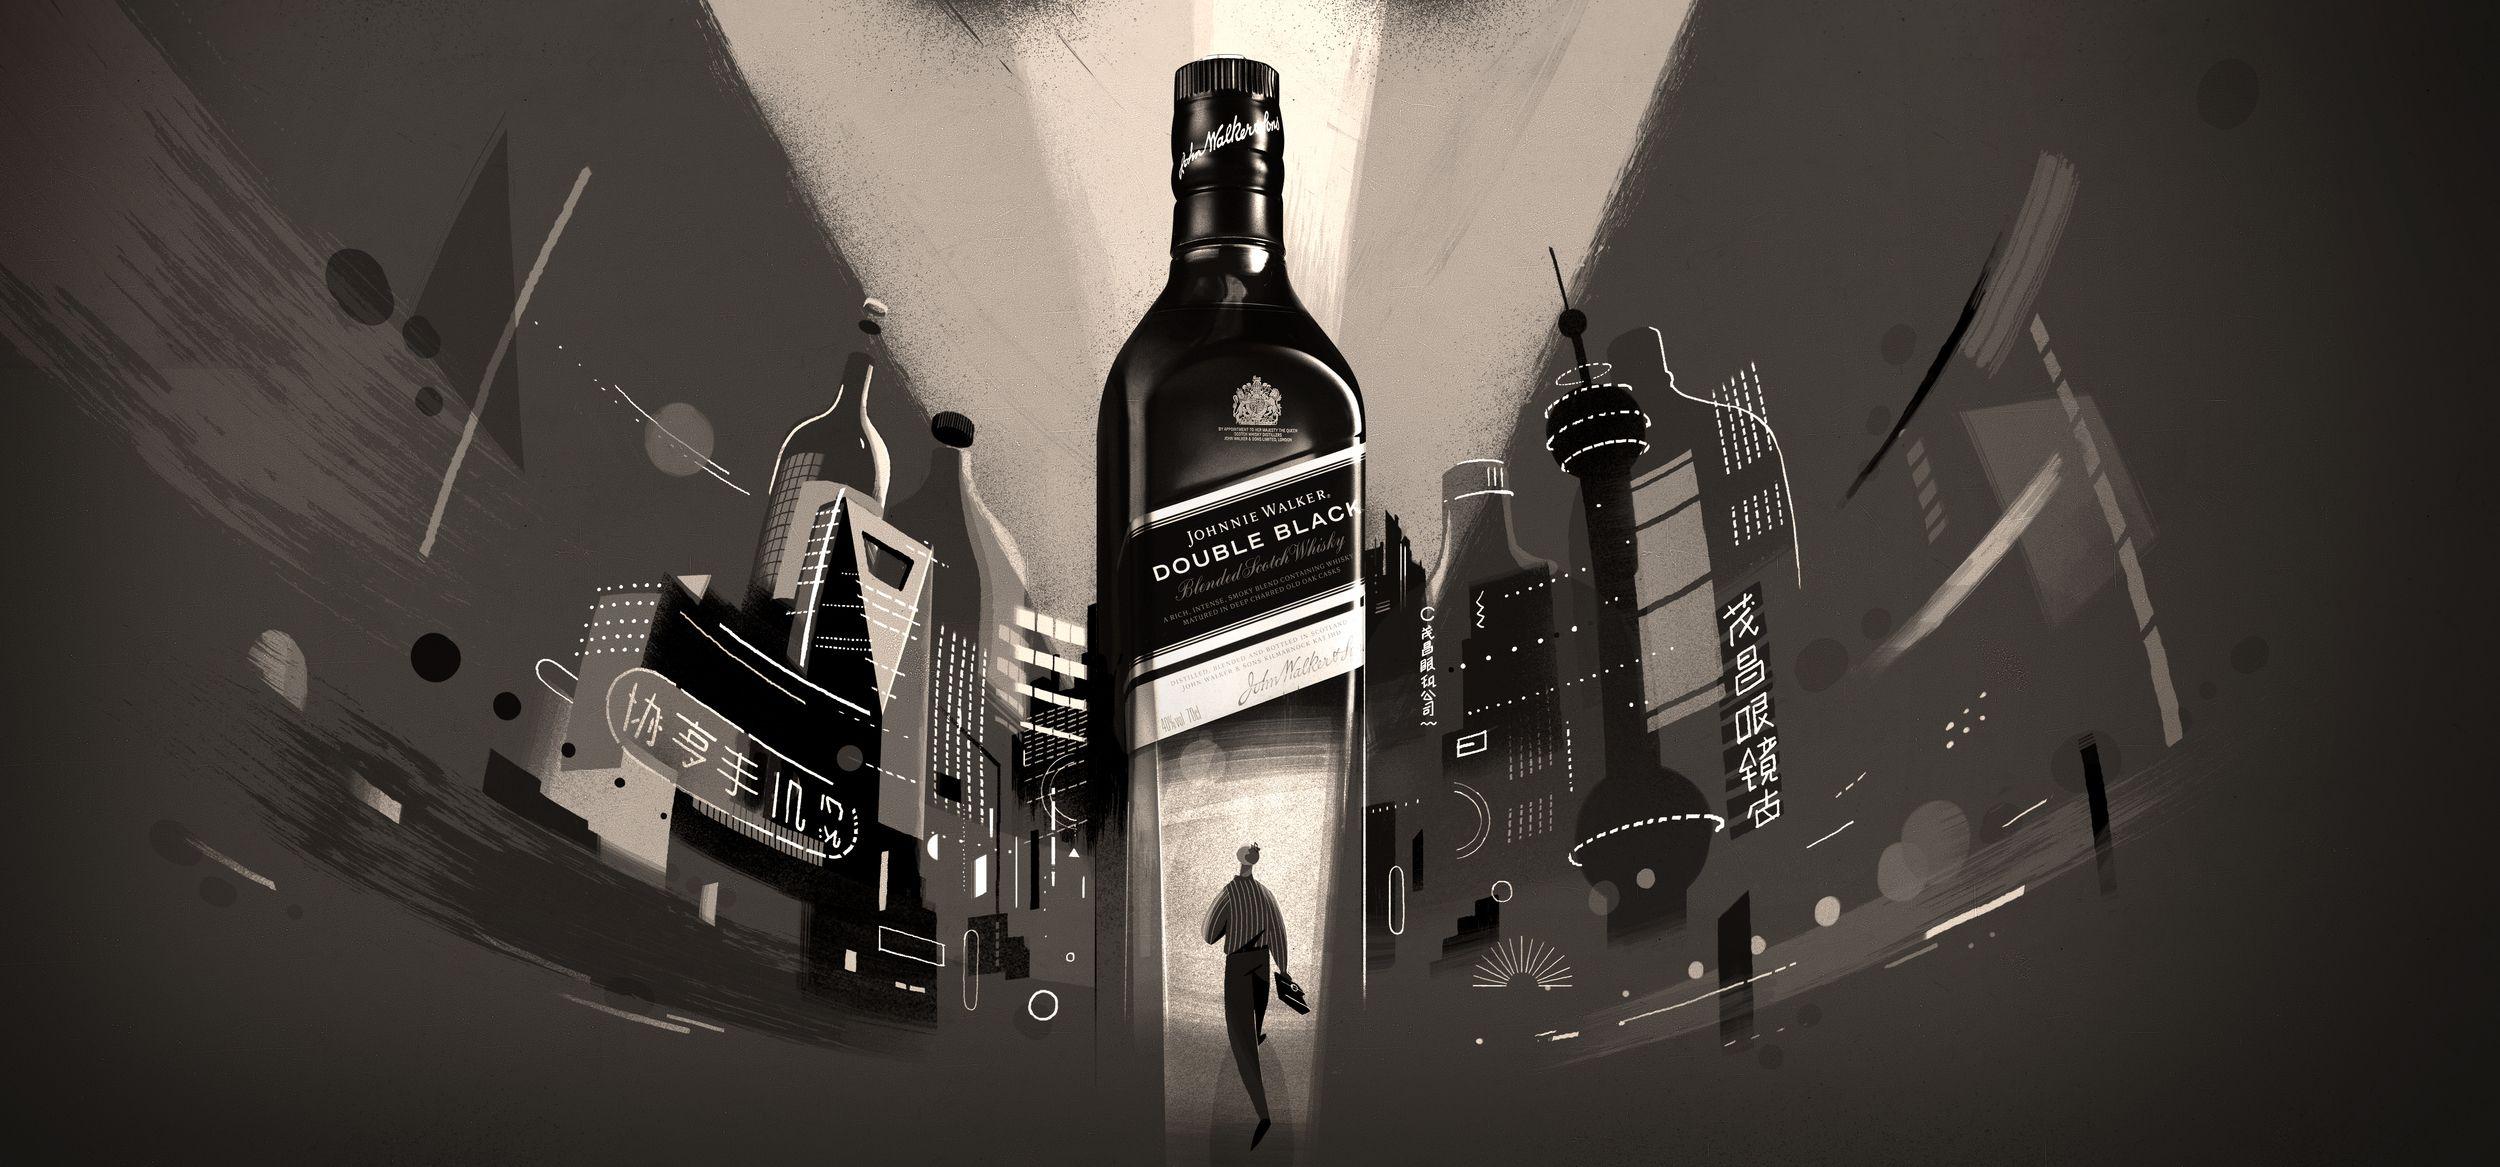 Design by Ken Gunn Lee - Concept by Joshua Harvey